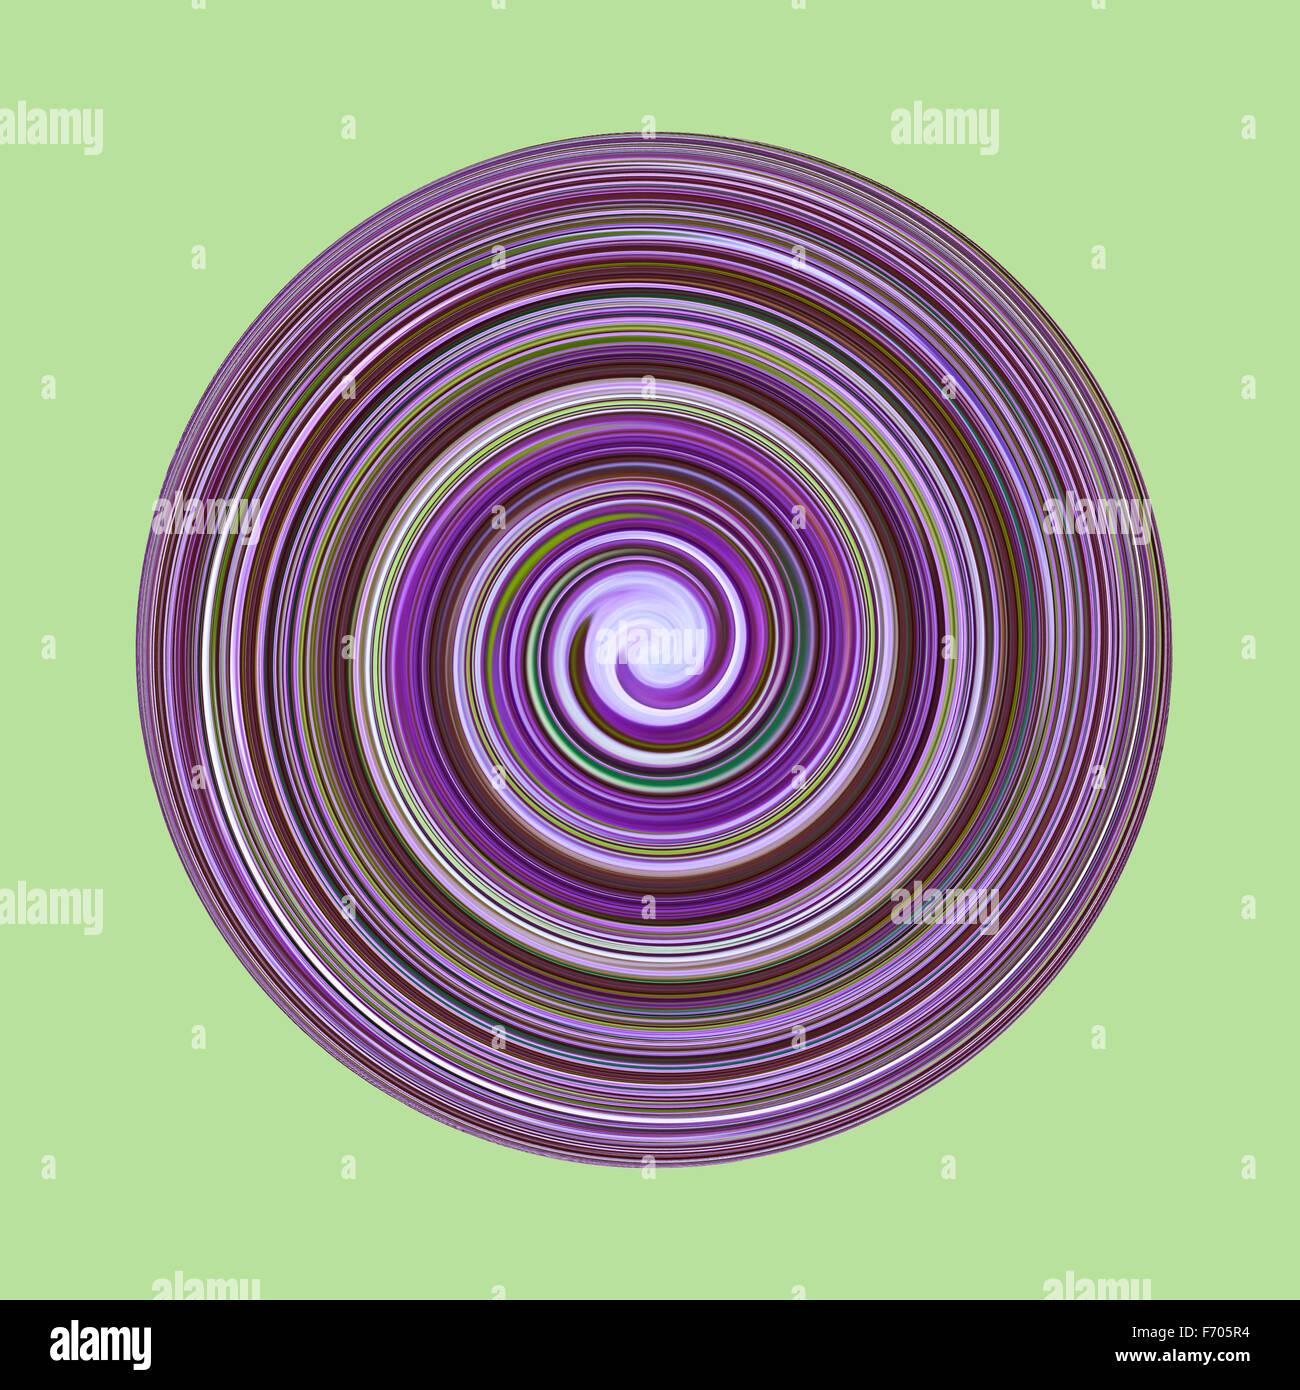 Abstract circular colour swirl - Stock Image